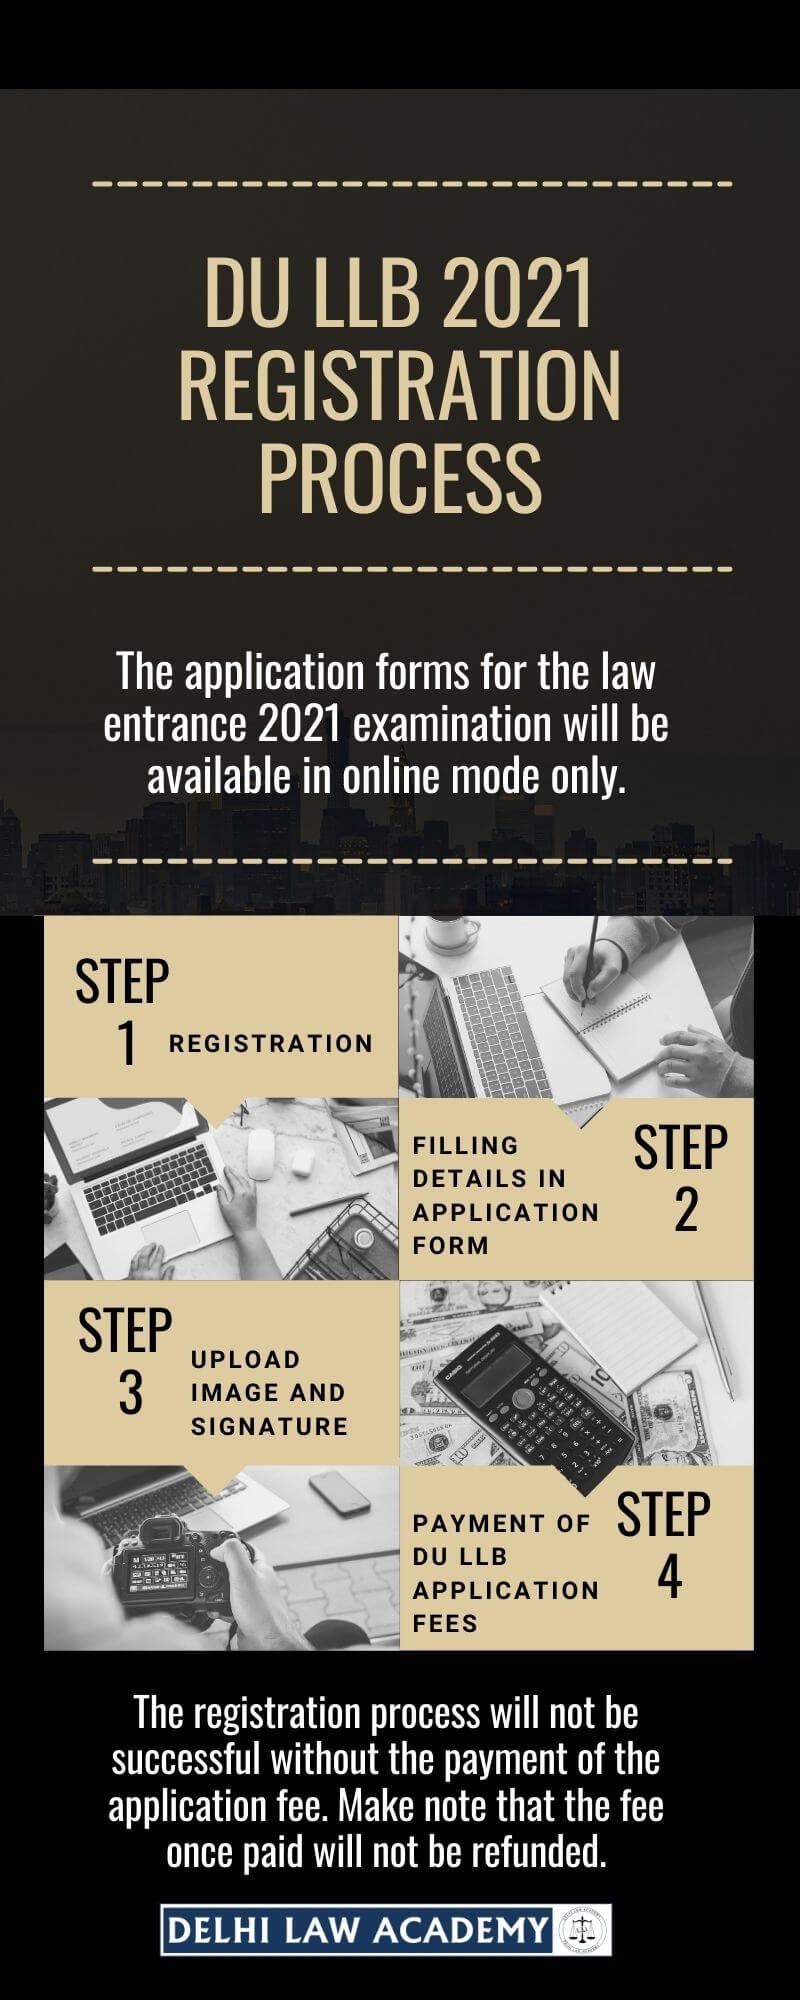 DU LLB 2021 Registration Process